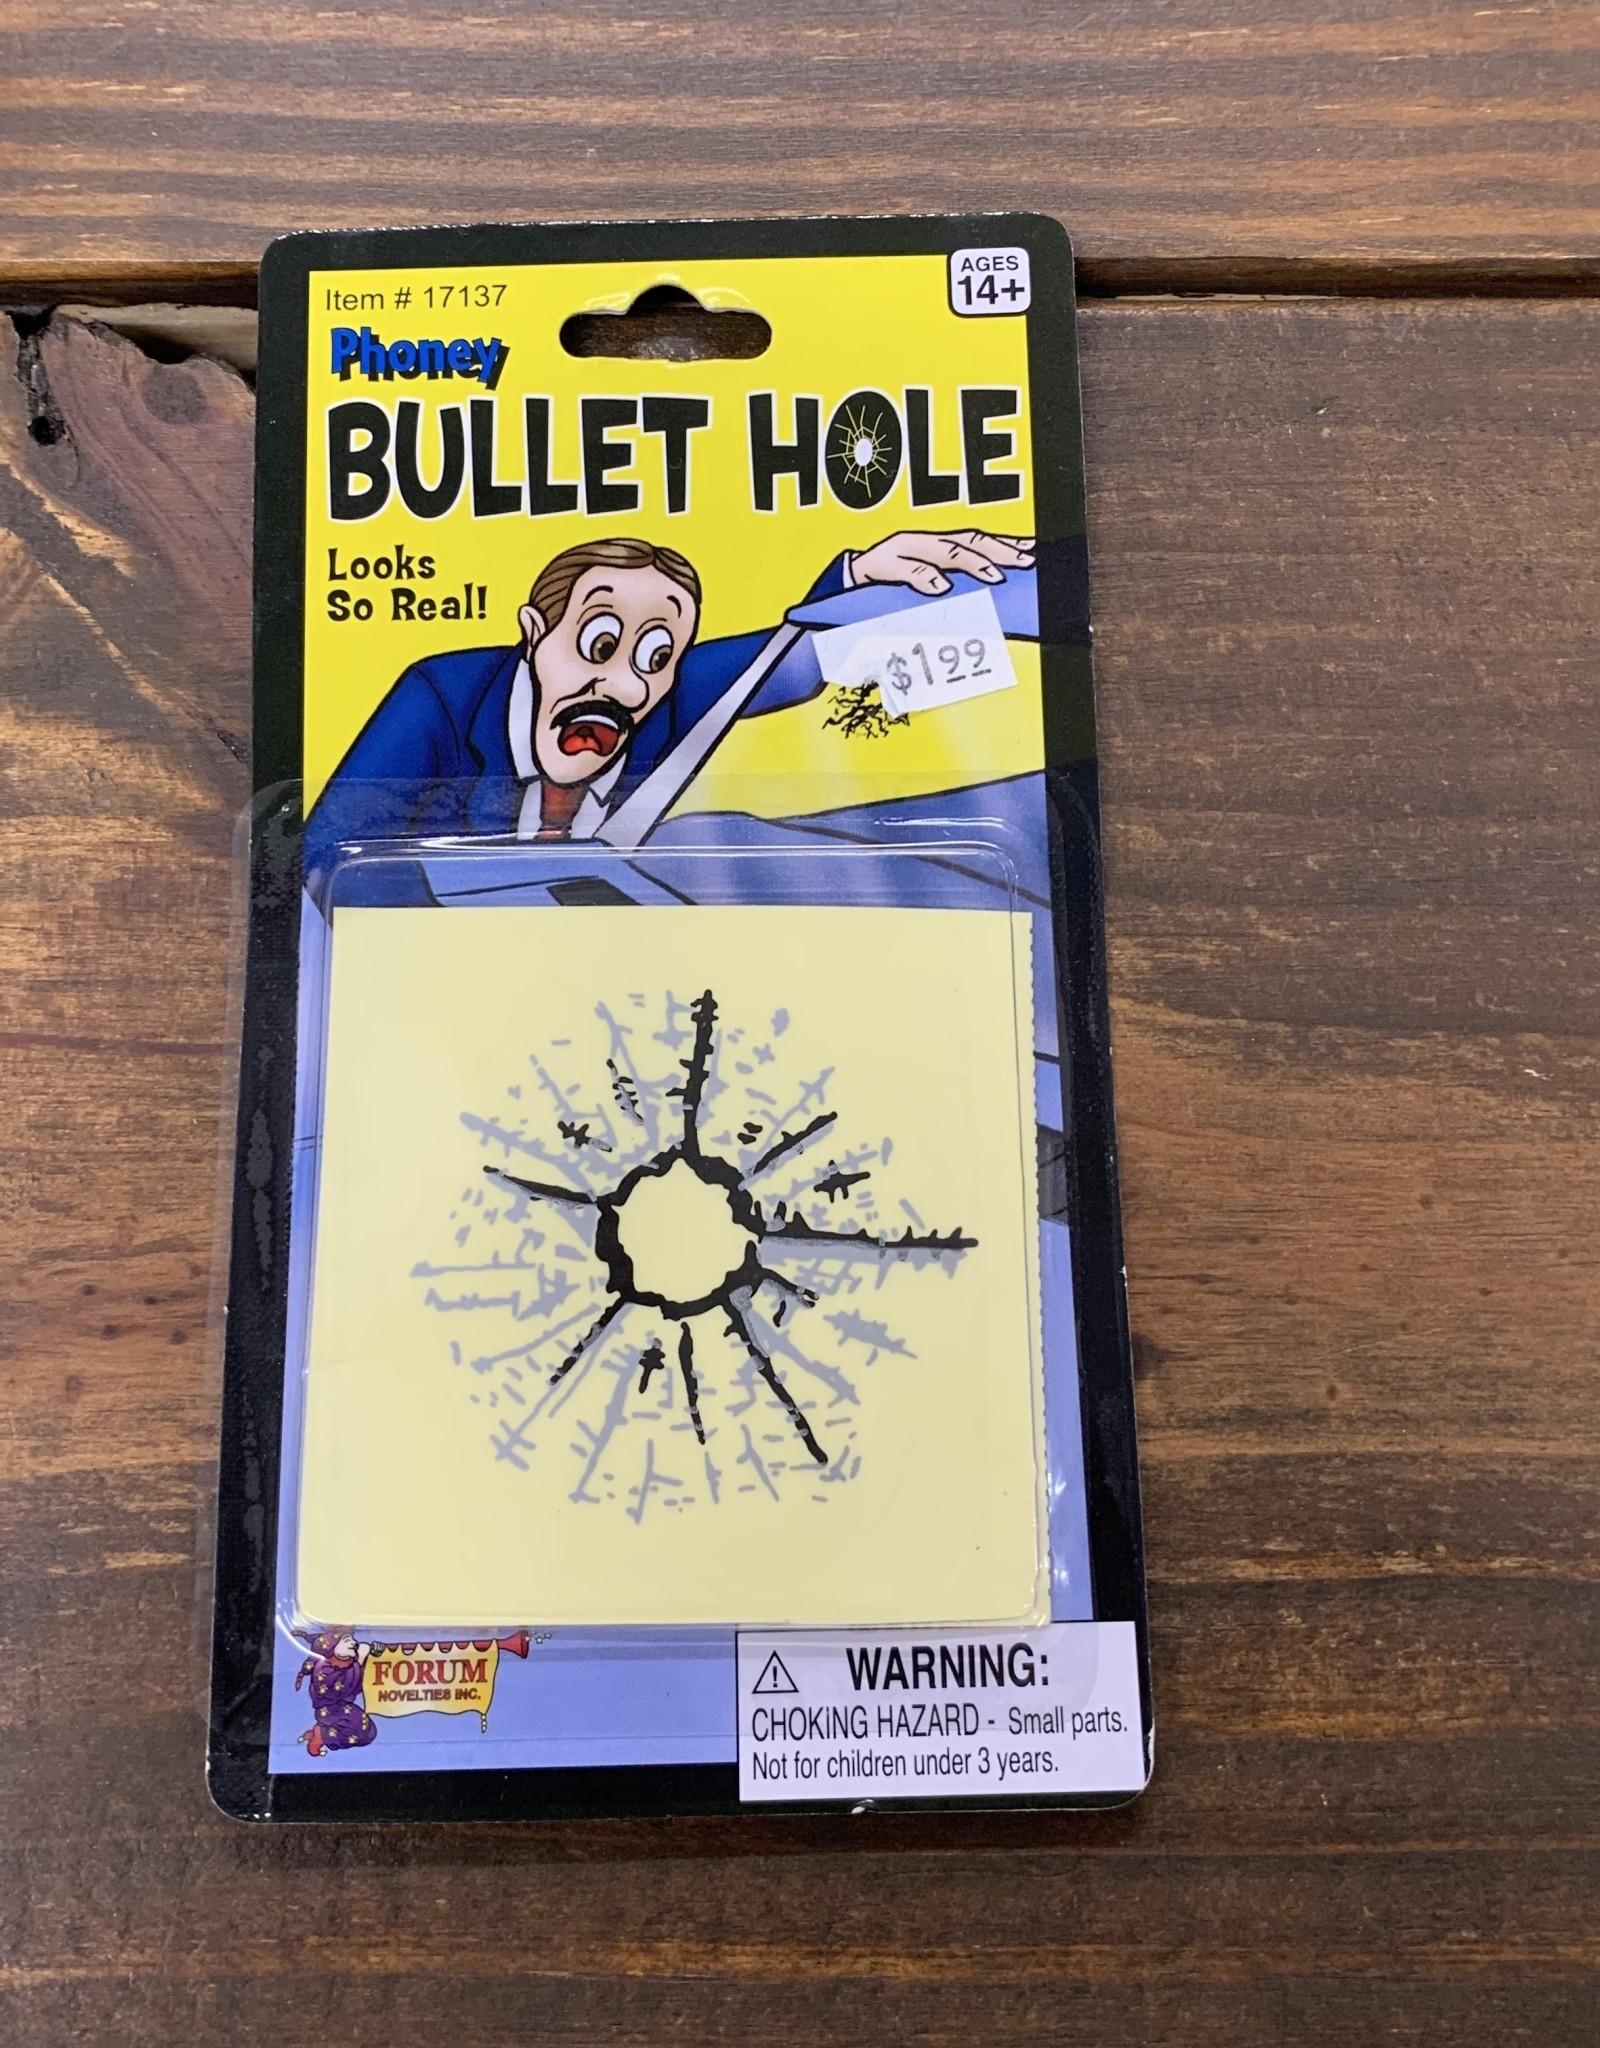 PHONEY BULLET HOLE